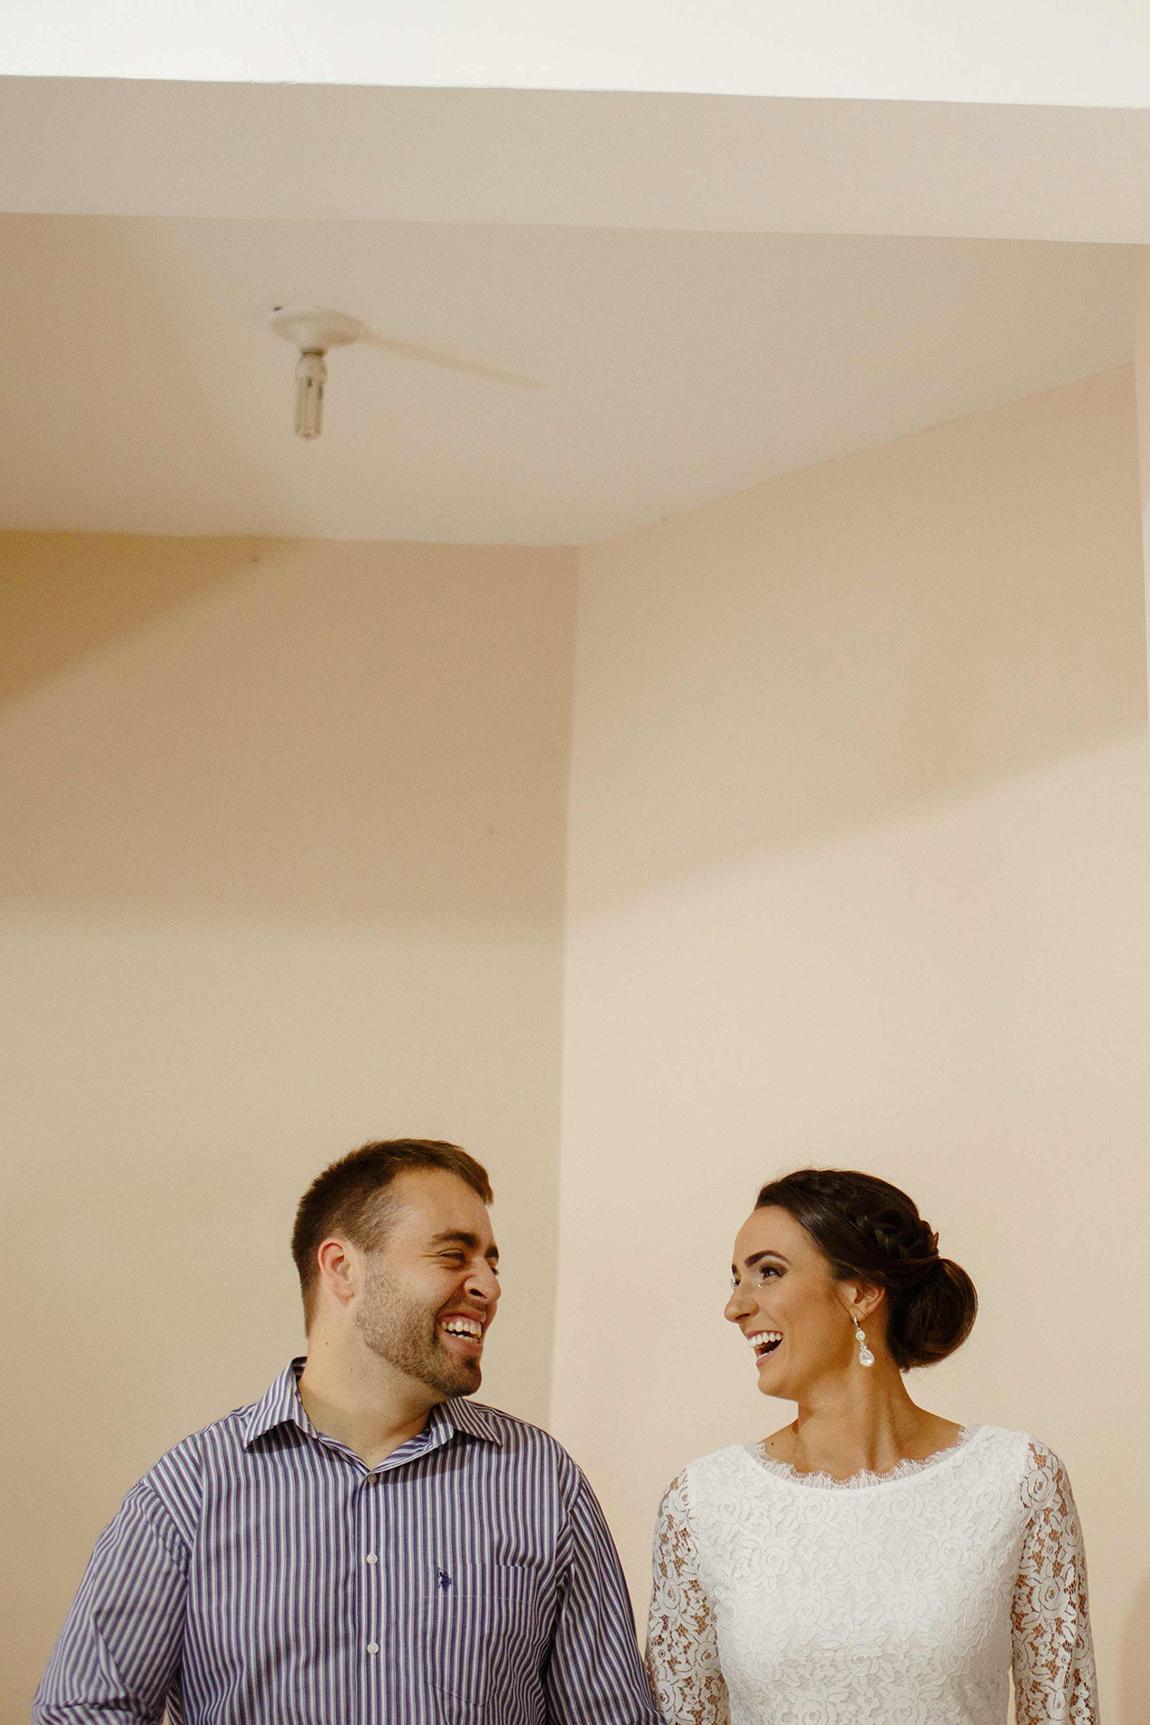 mariana-alves-fotografia-curitiba-casamento-civil-ensaio-nicole-luiz (26)